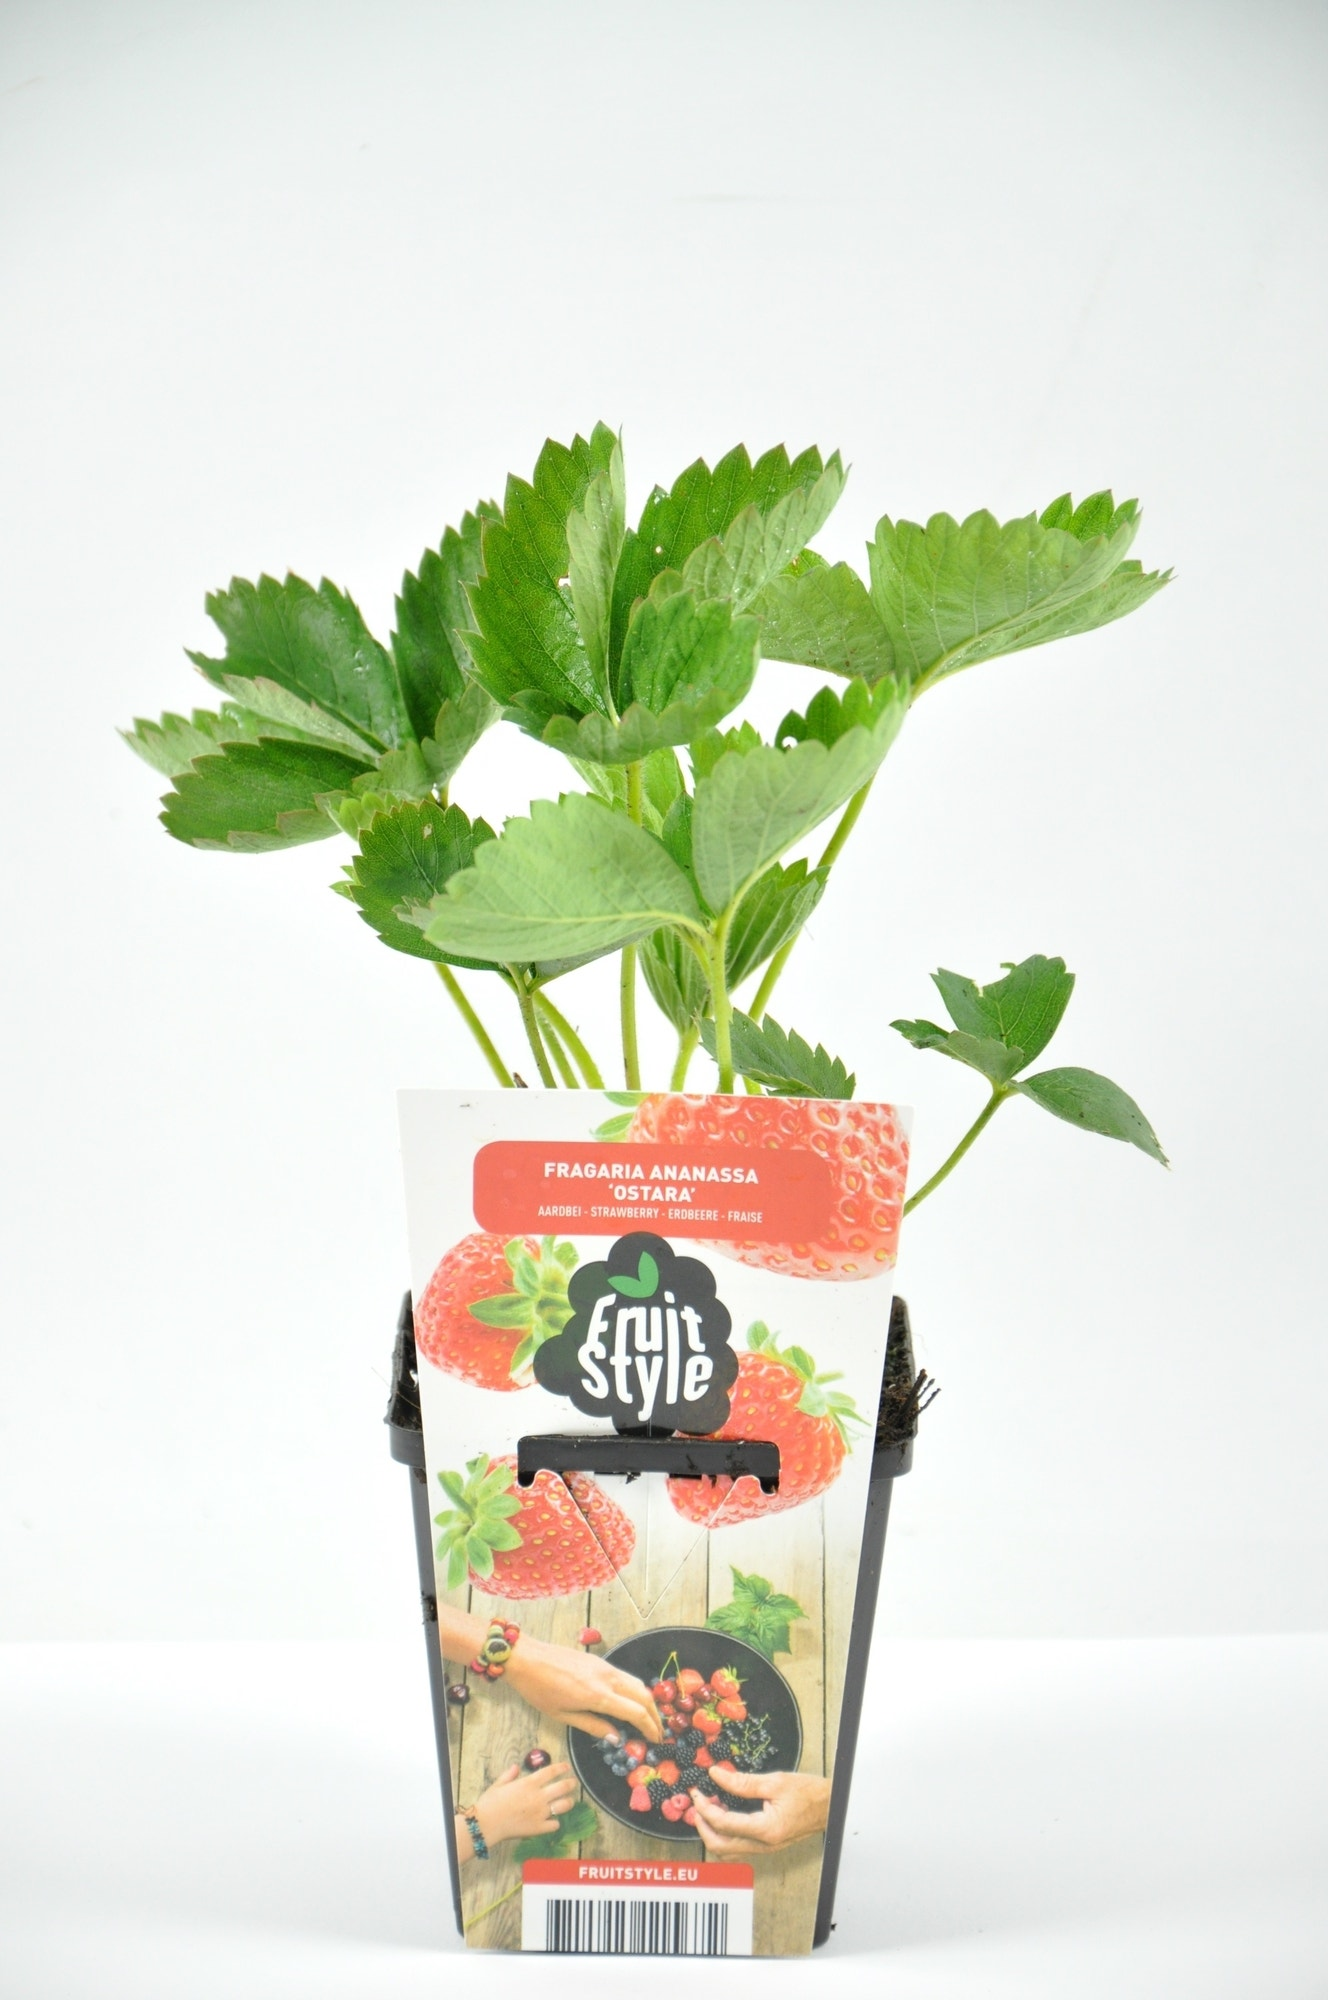 Aardbei (Fragaria ananassa 'Ostara')-Plant in pot-P9 (9x9 cm pot). Kleur: wit